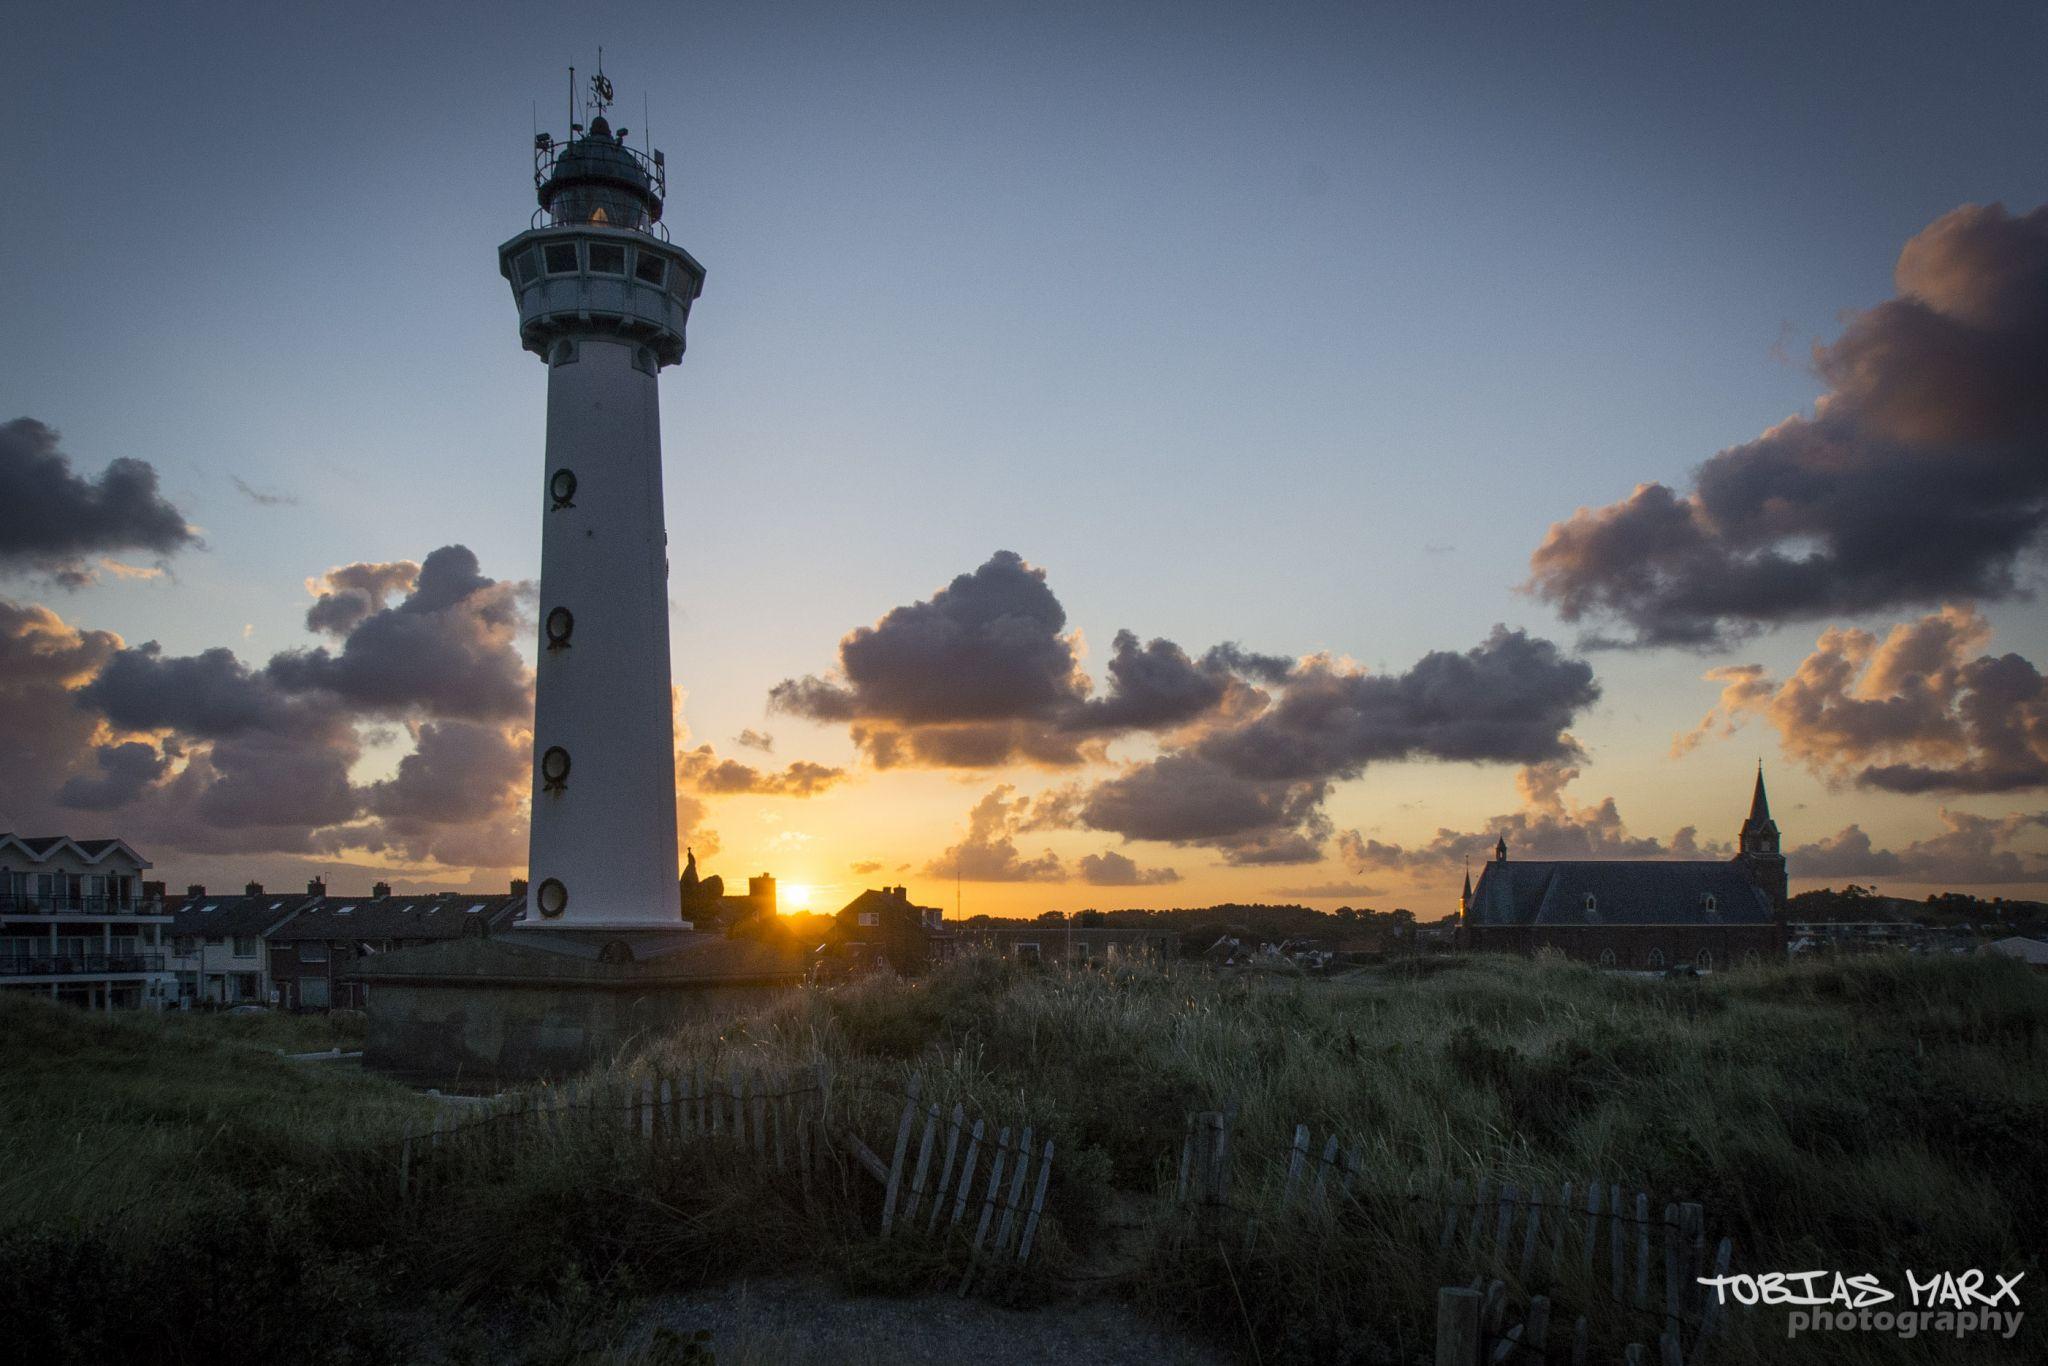 lighthouse of Egmond, Netherlands